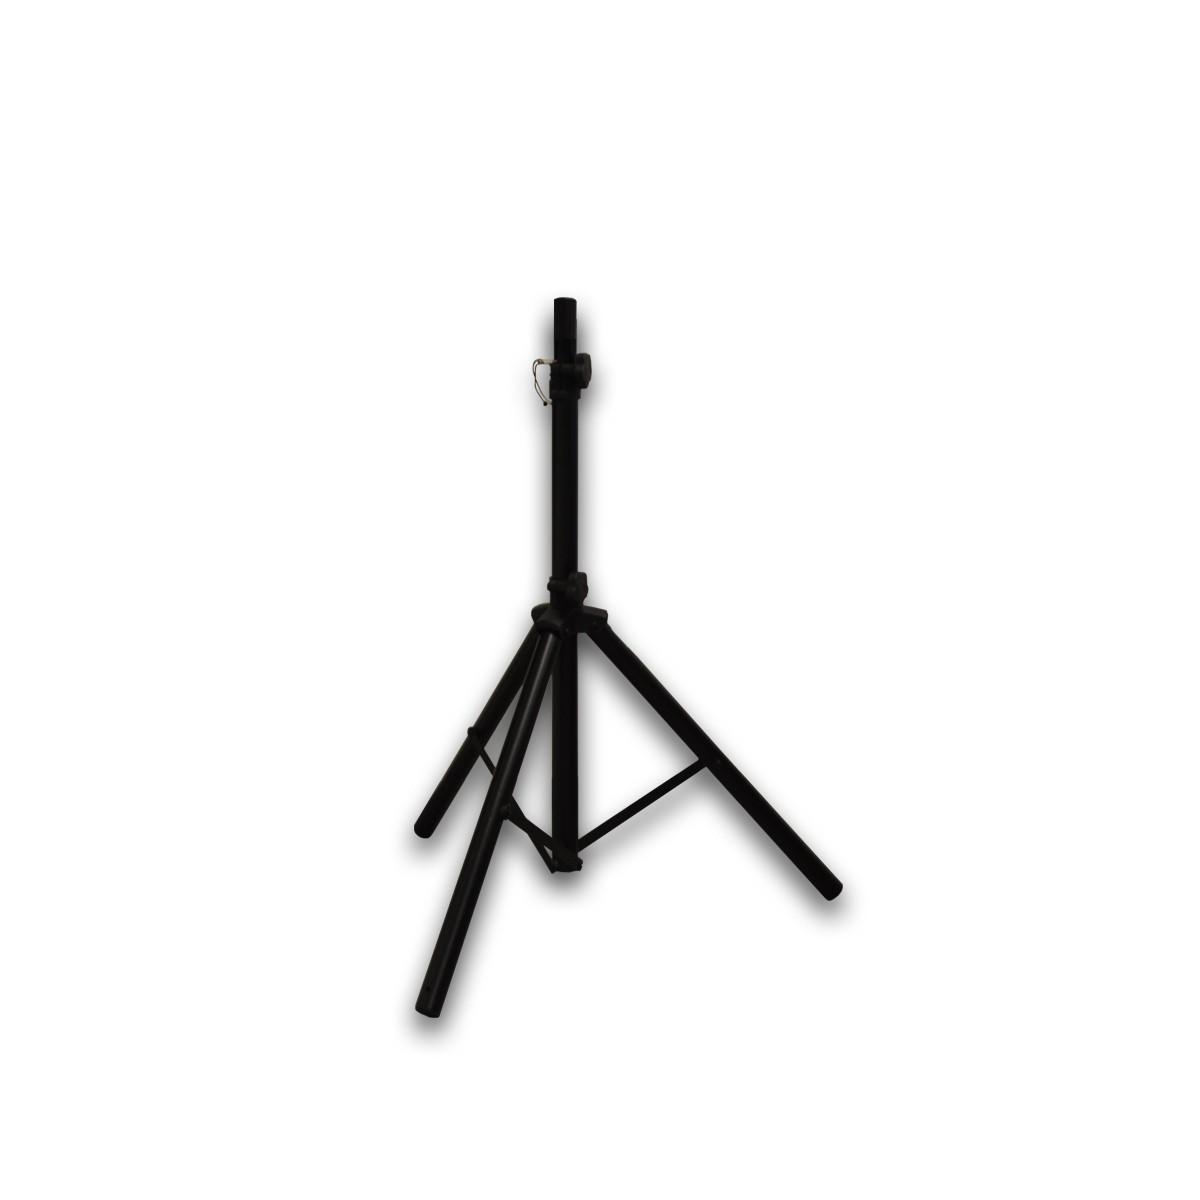 PremiumX 4K Camping SAT Anlage 80cm Stahl Anthrazit Antenne mit Single LNB + Dreibein Stativ inkl. 3x Stahl-Heringe